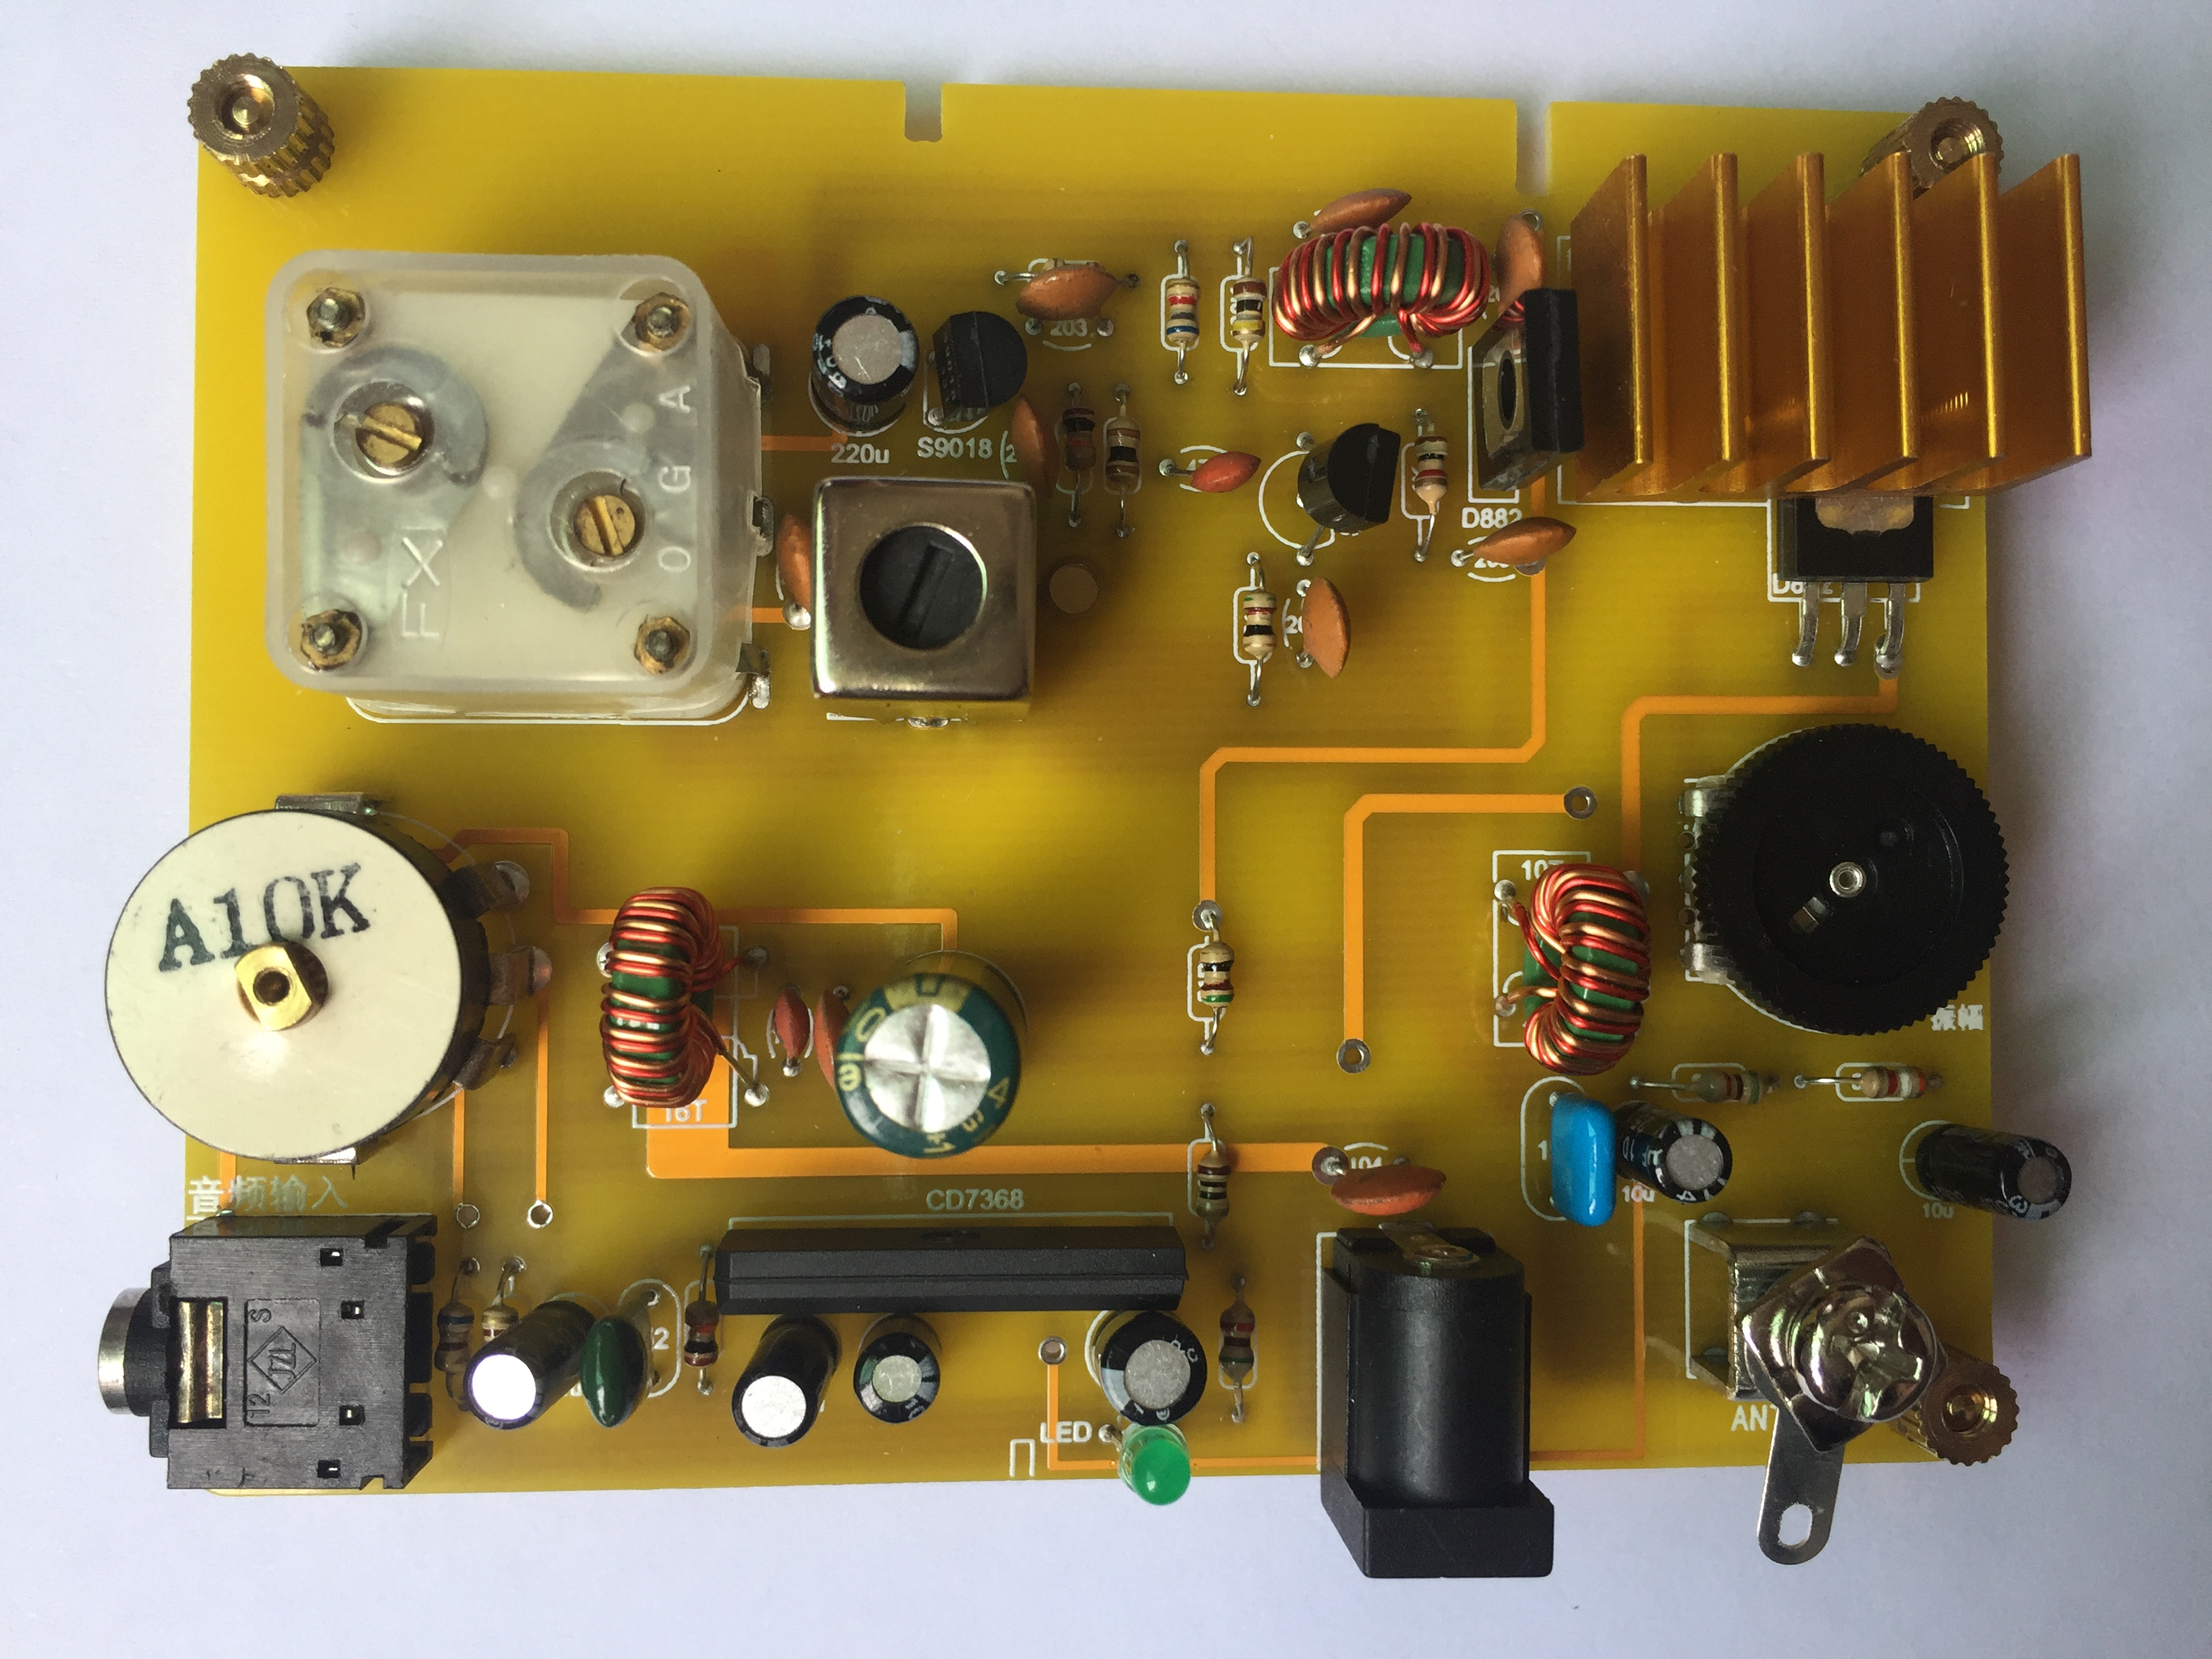 Radio Experimental Medium Wave Transmitter, AM Transmitter 530-1600KHZ